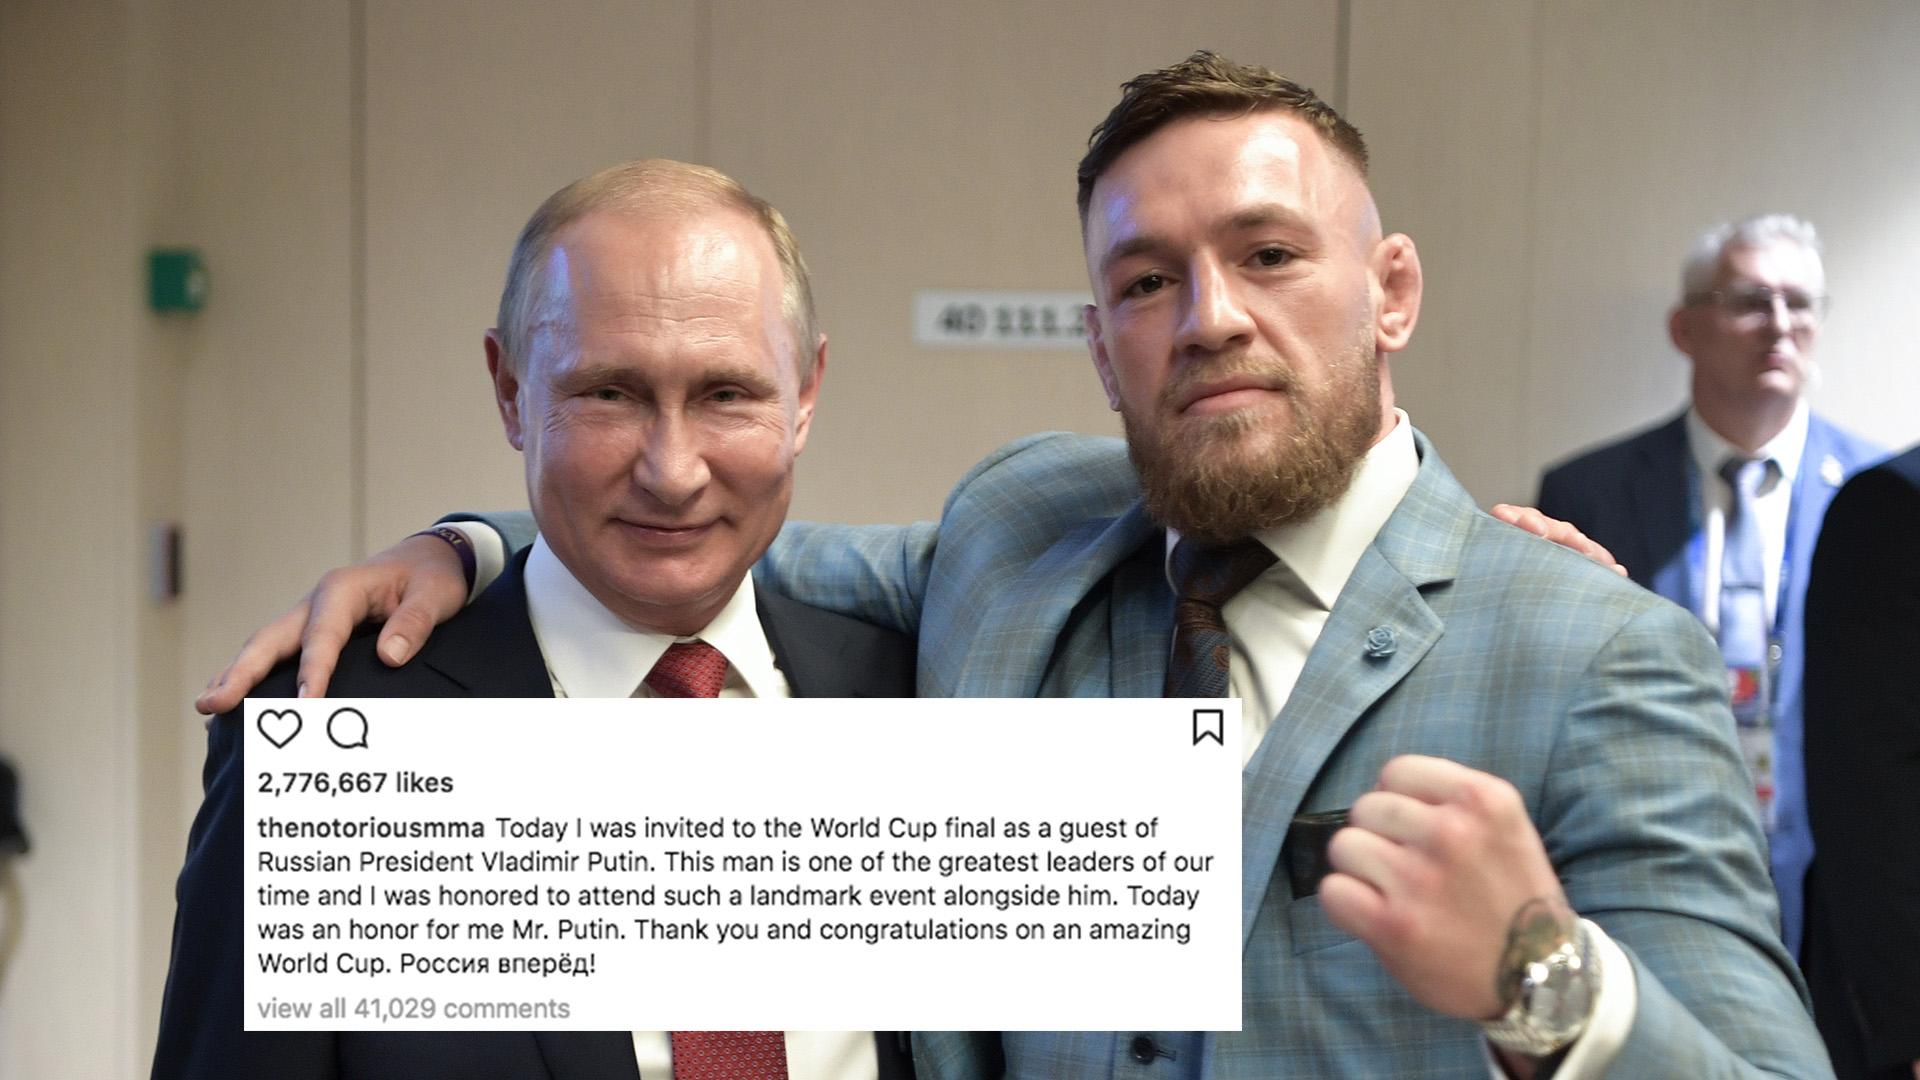 Conor Mcgregor Gets Slammed For Instagram Post About Putin